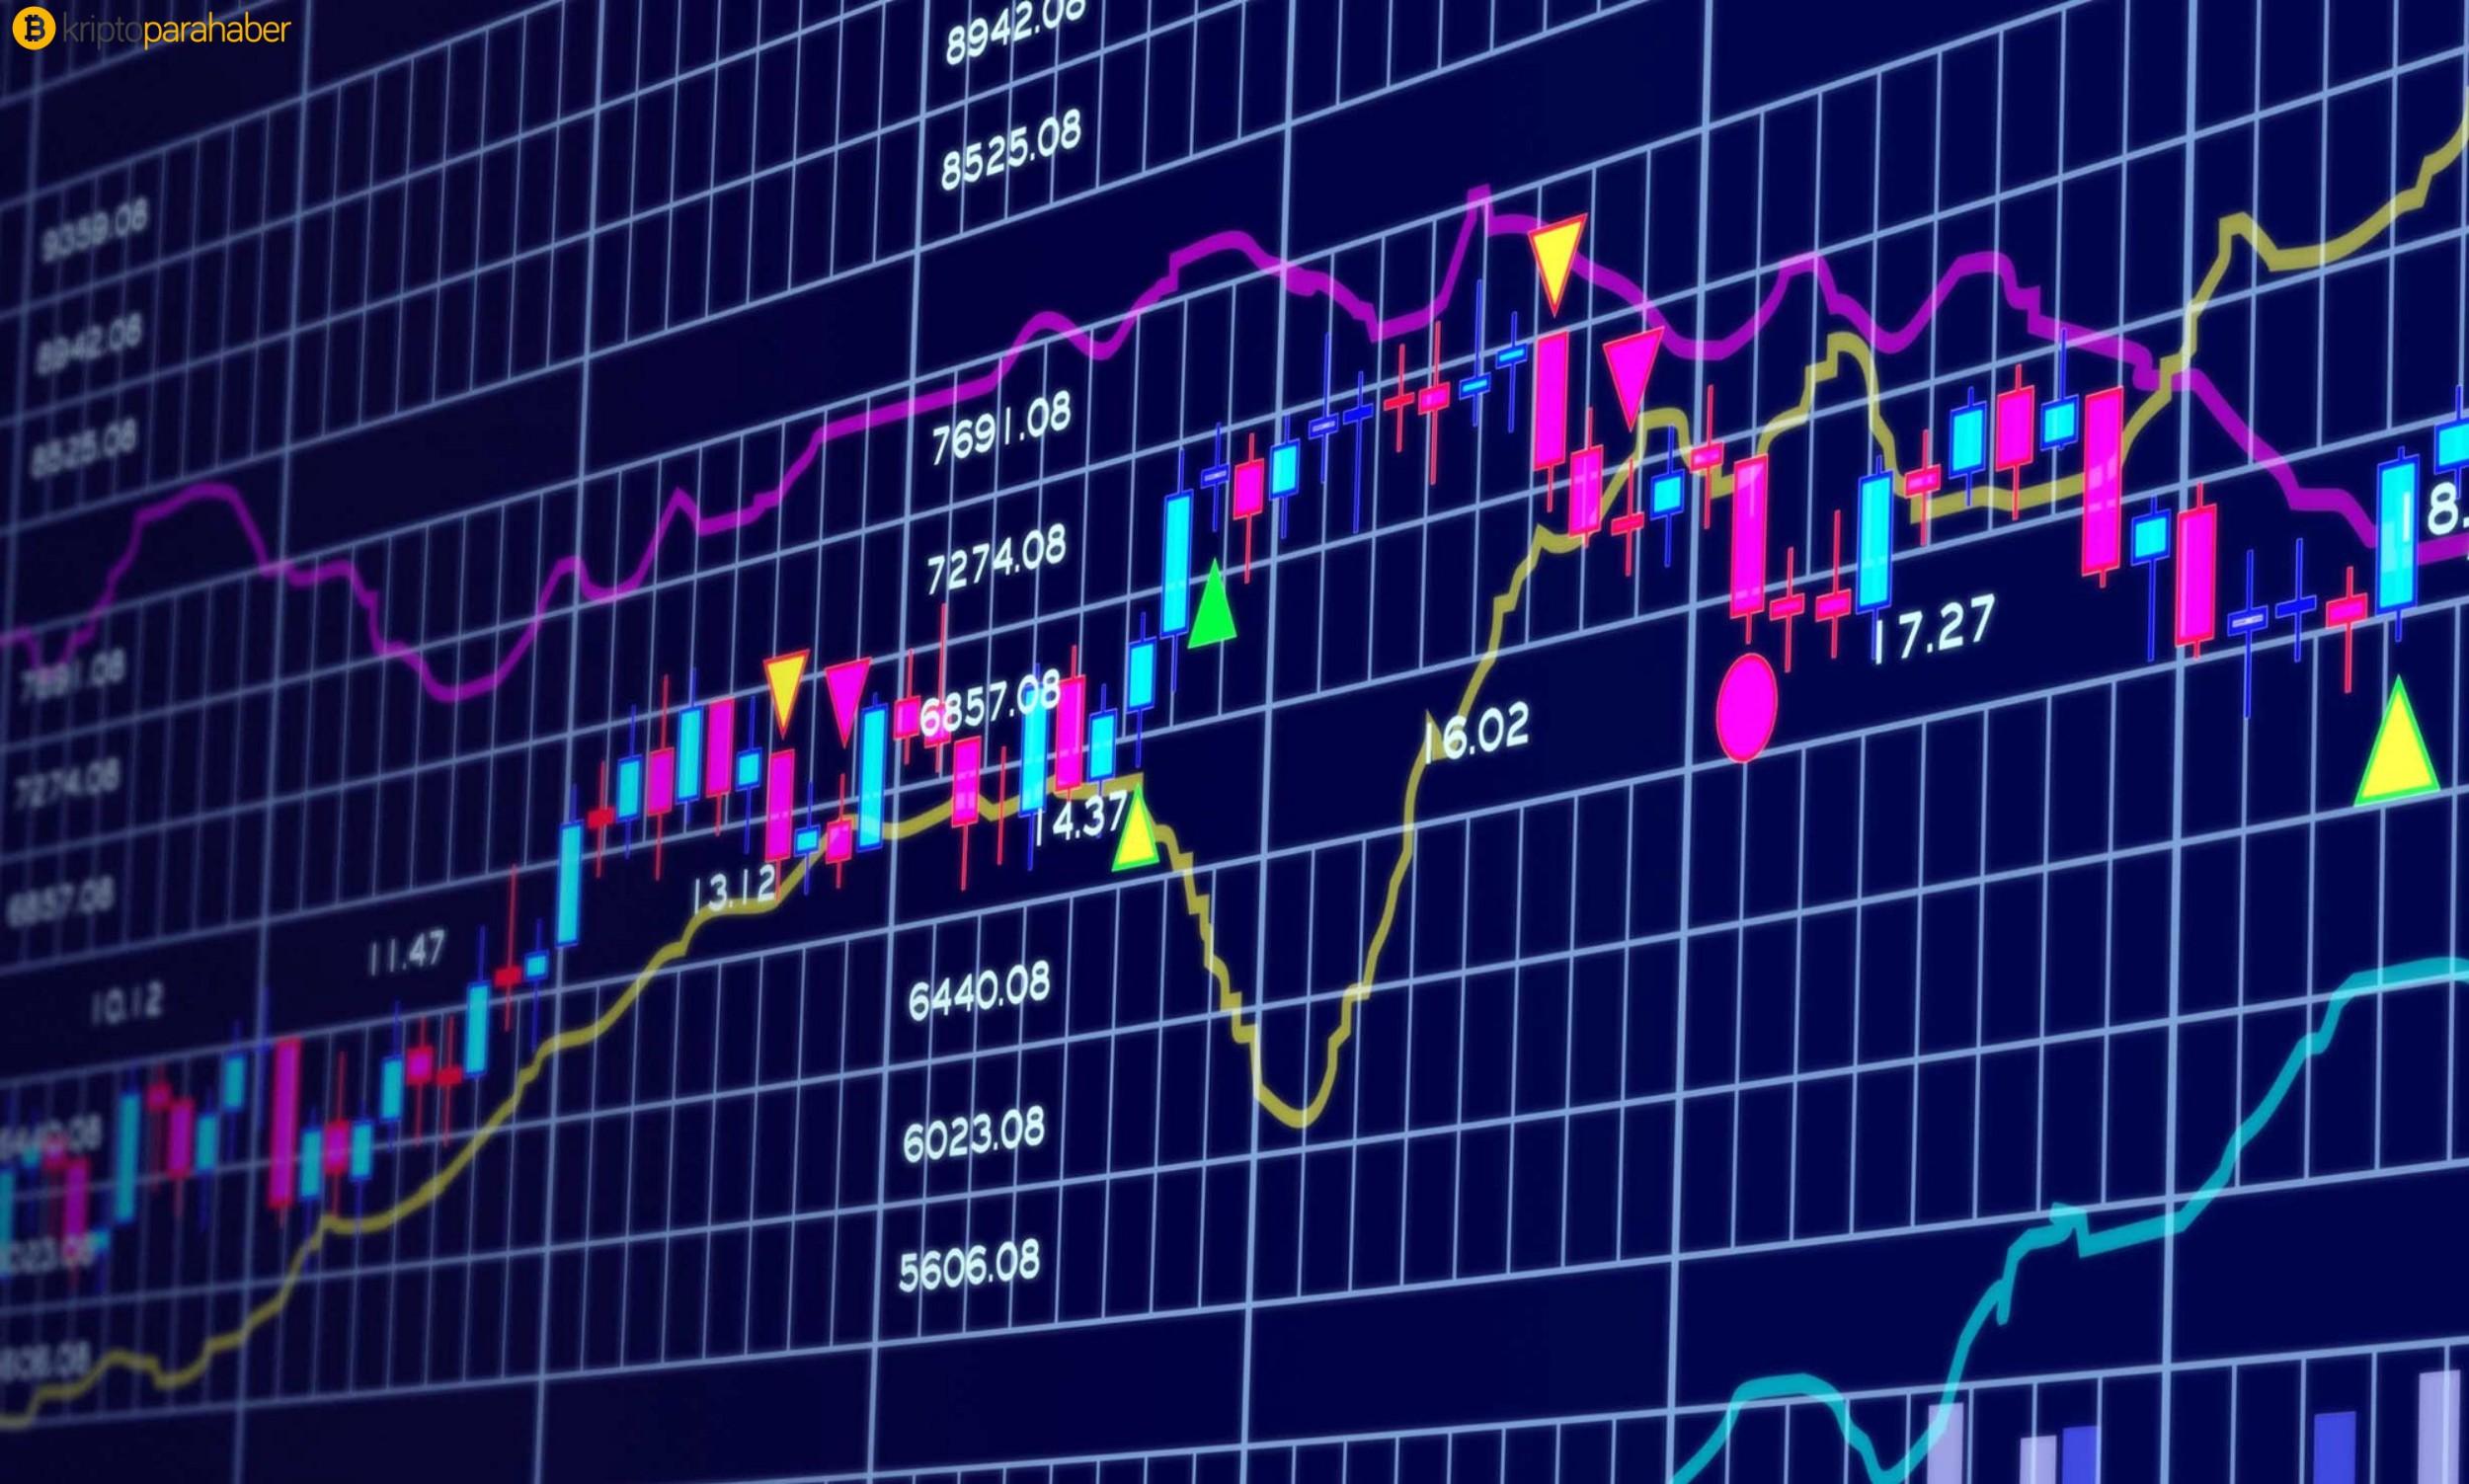 28 Eylül Tron (TRX) ve Polkadot (DOT) fiyat analizi